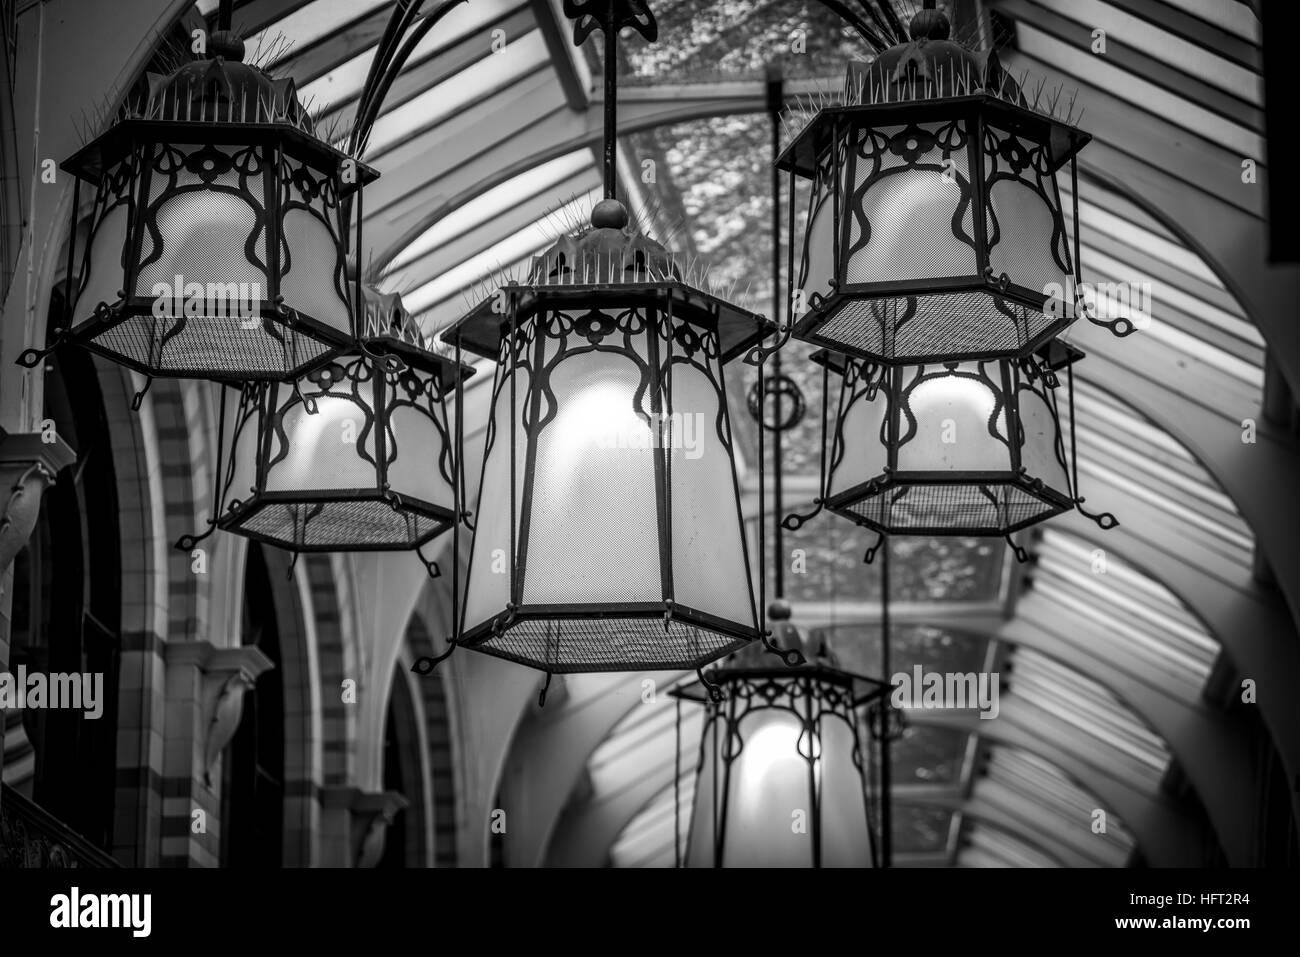 Royal Arcade hanging lights Stock Photo